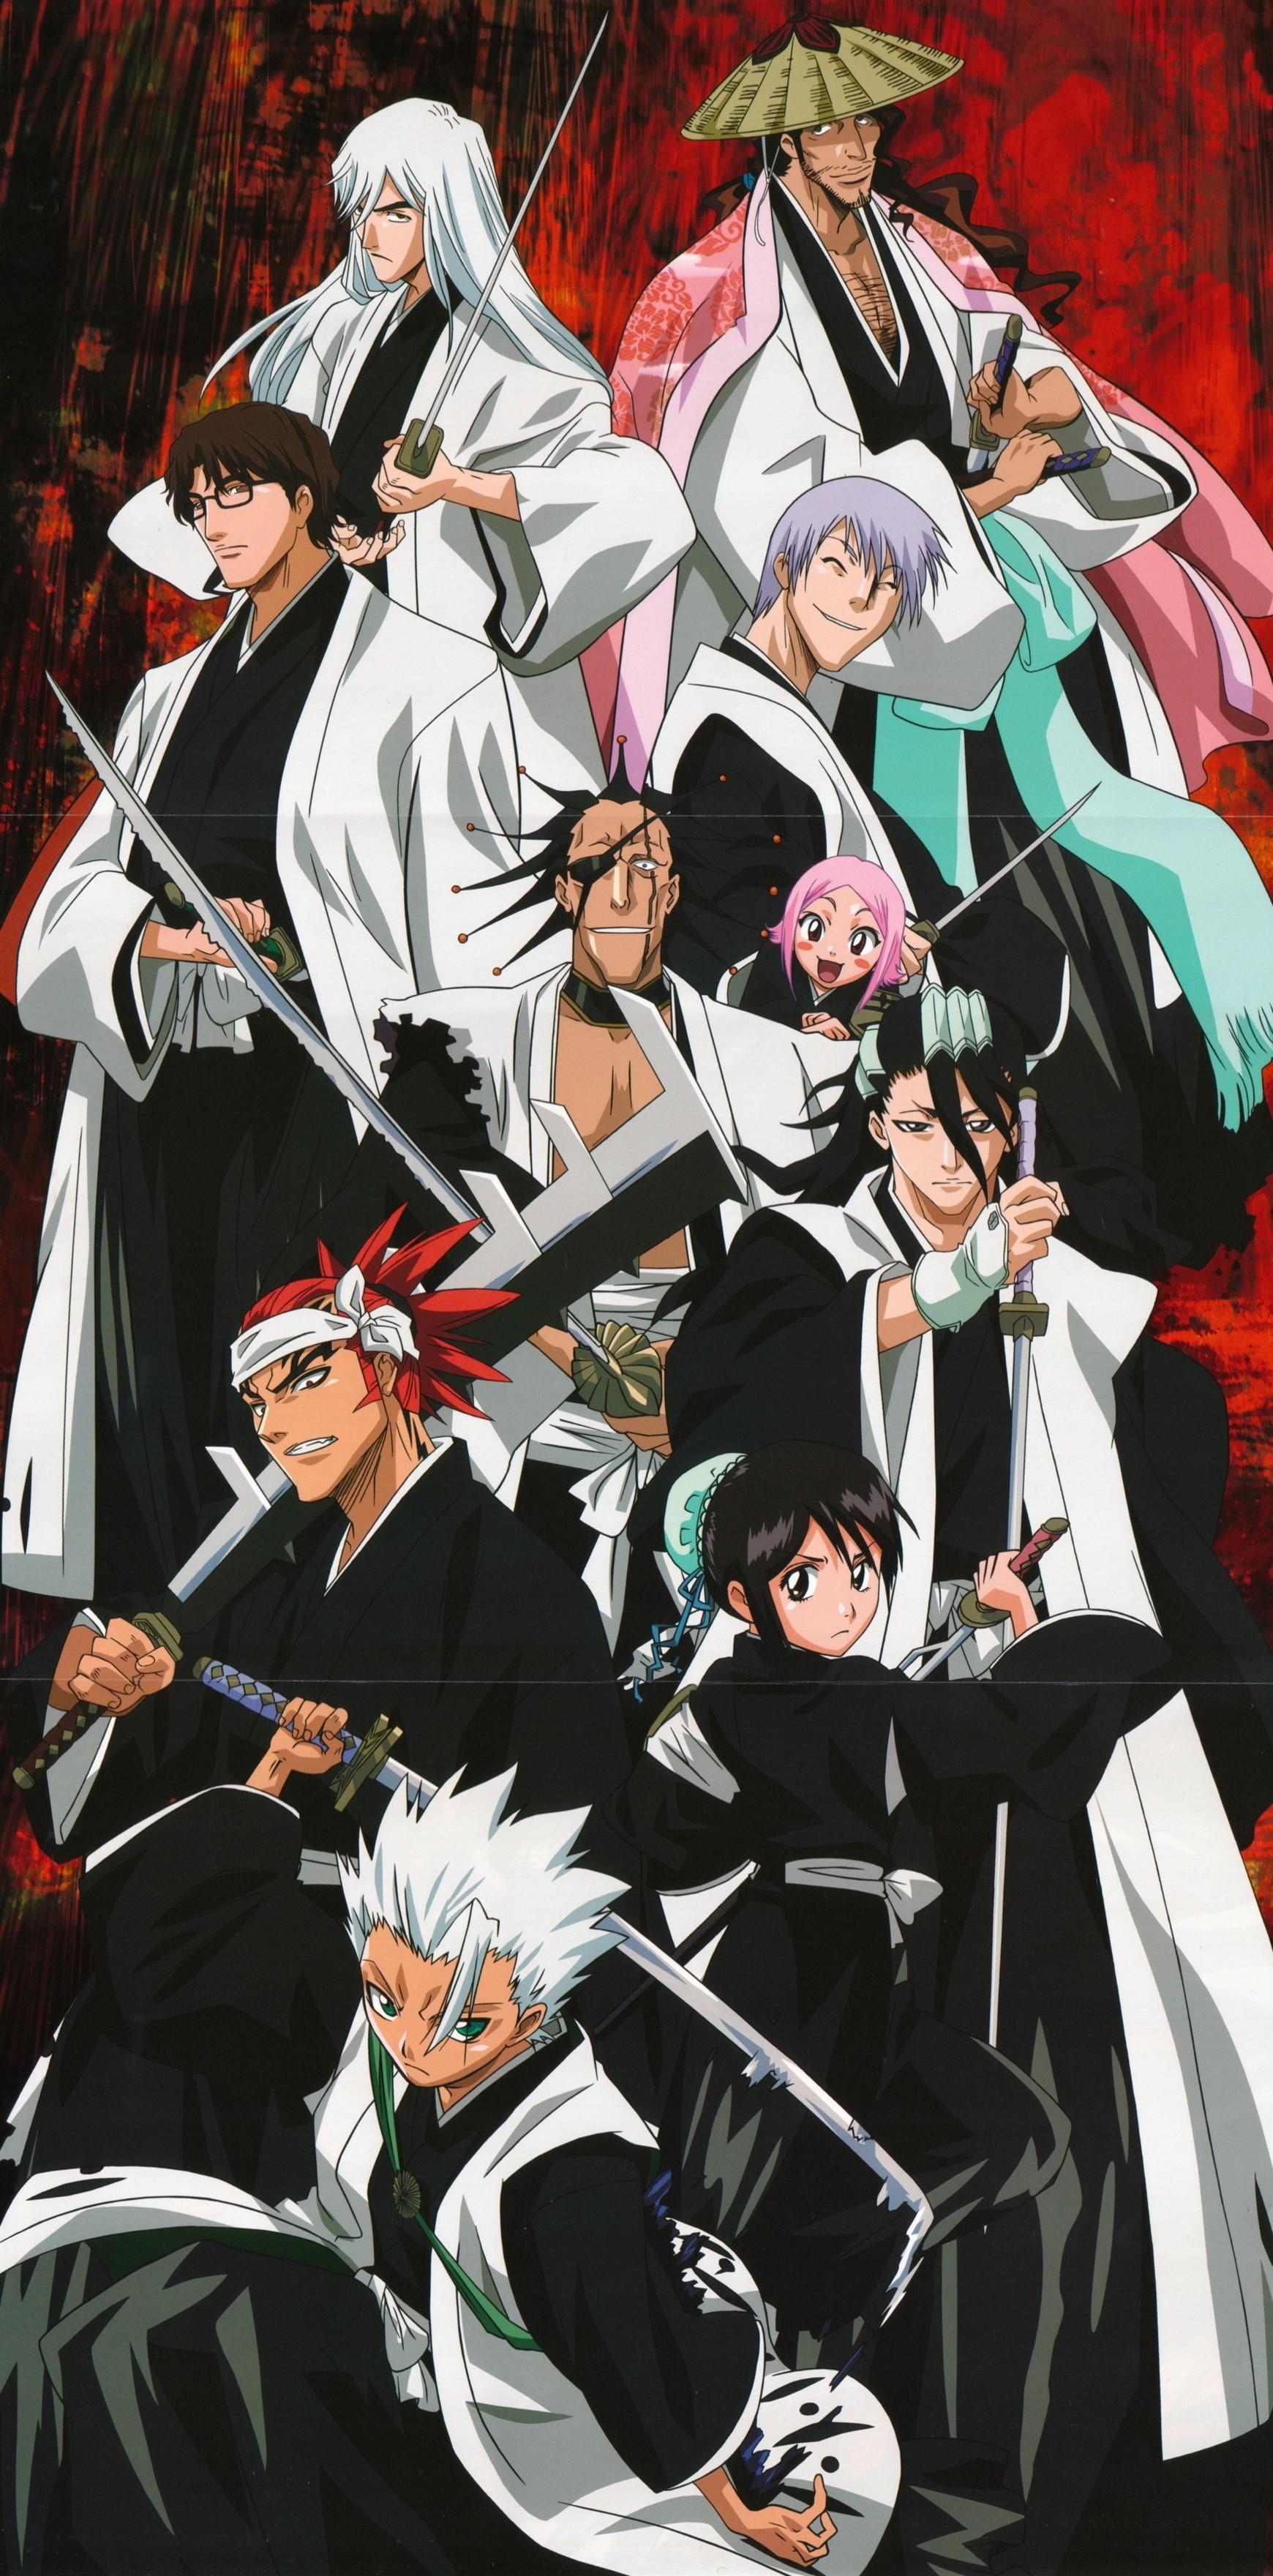 Bleach Manga Wallpapers - Wallpaper Cave